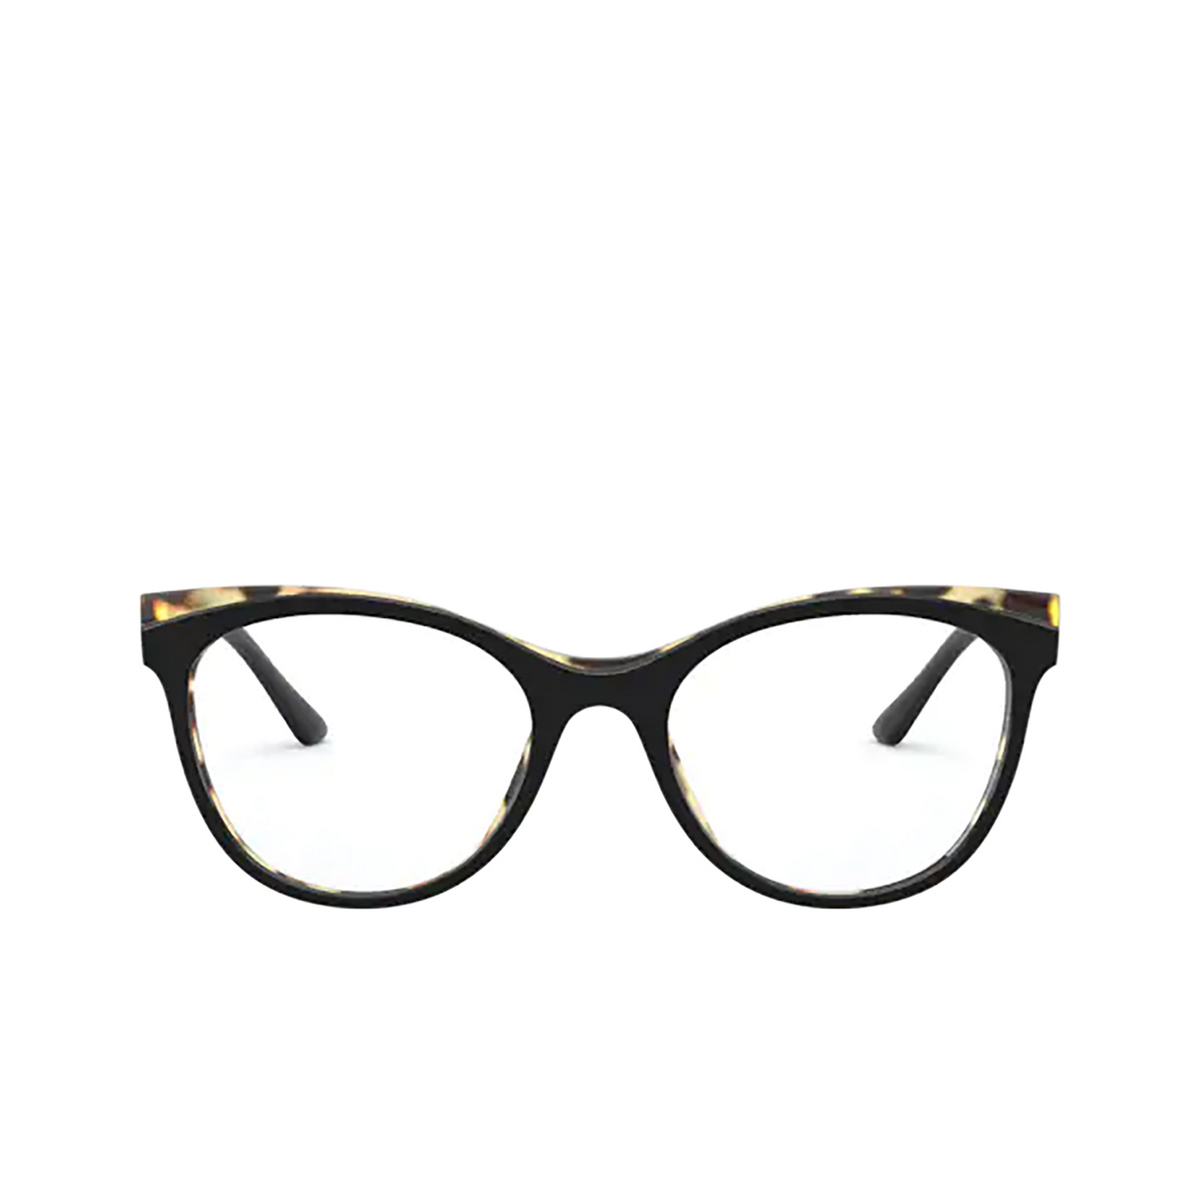 Prada® Butterfly Eyeglasses: PR 05WV color Black / Havana 3891O1 - front view.